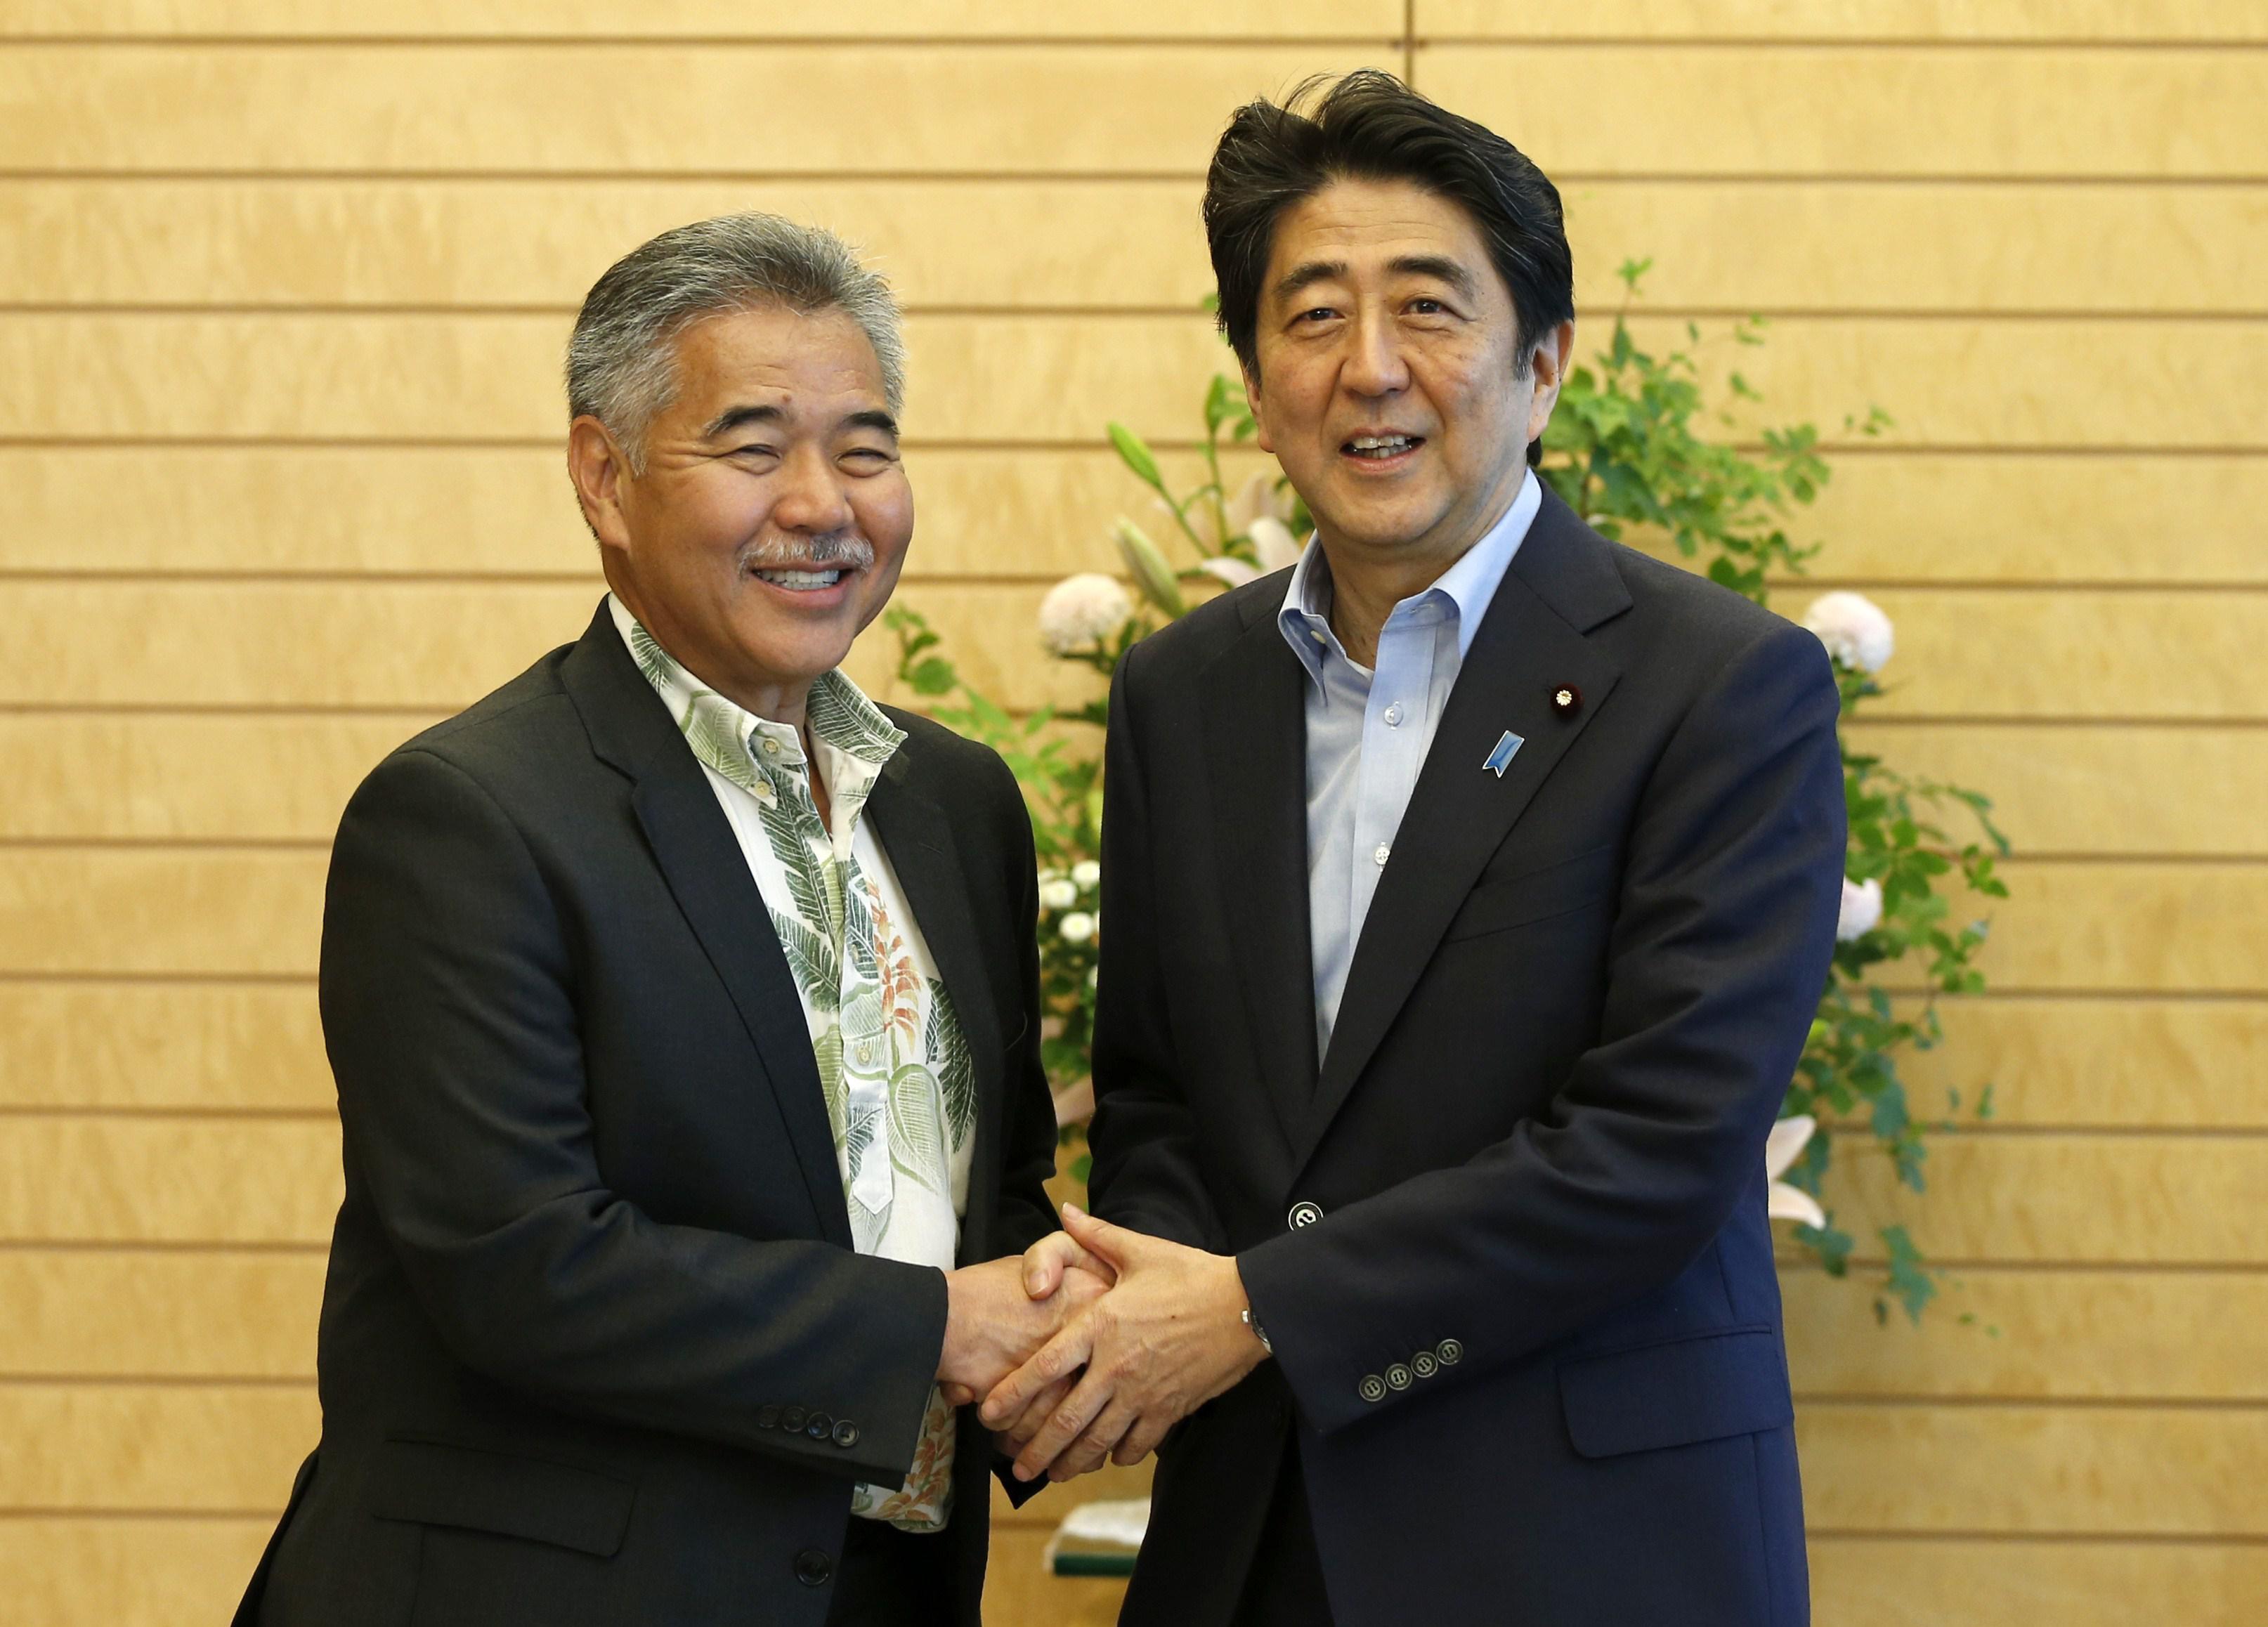 David Ige shakes hands with Shinzo Abe.